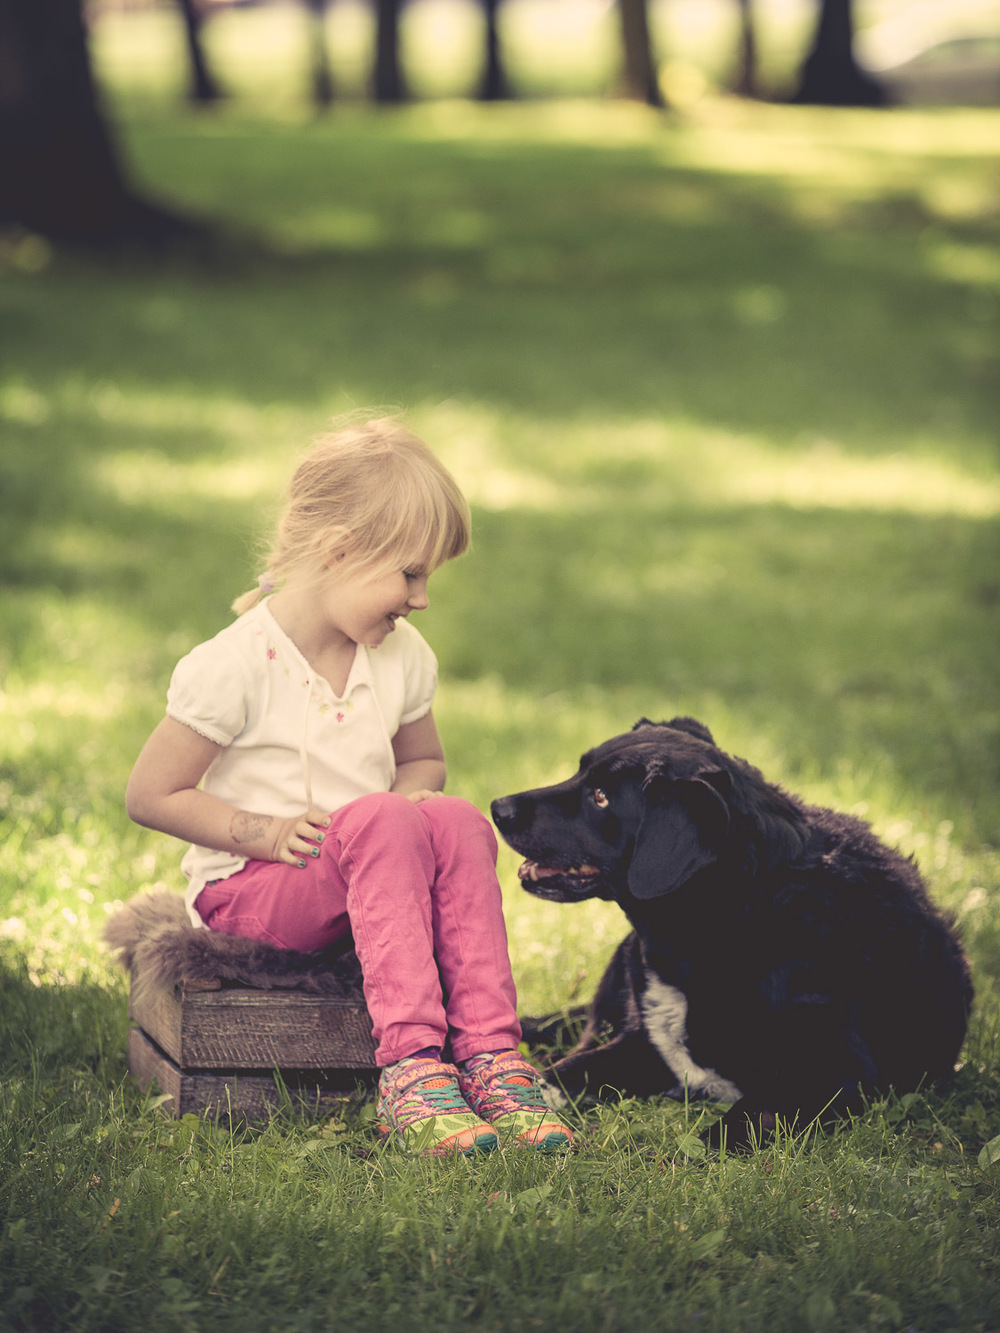 hund-hundefotograf-hundefotografering-fotograf-hodnedesign-pål-hodne--49.jpg